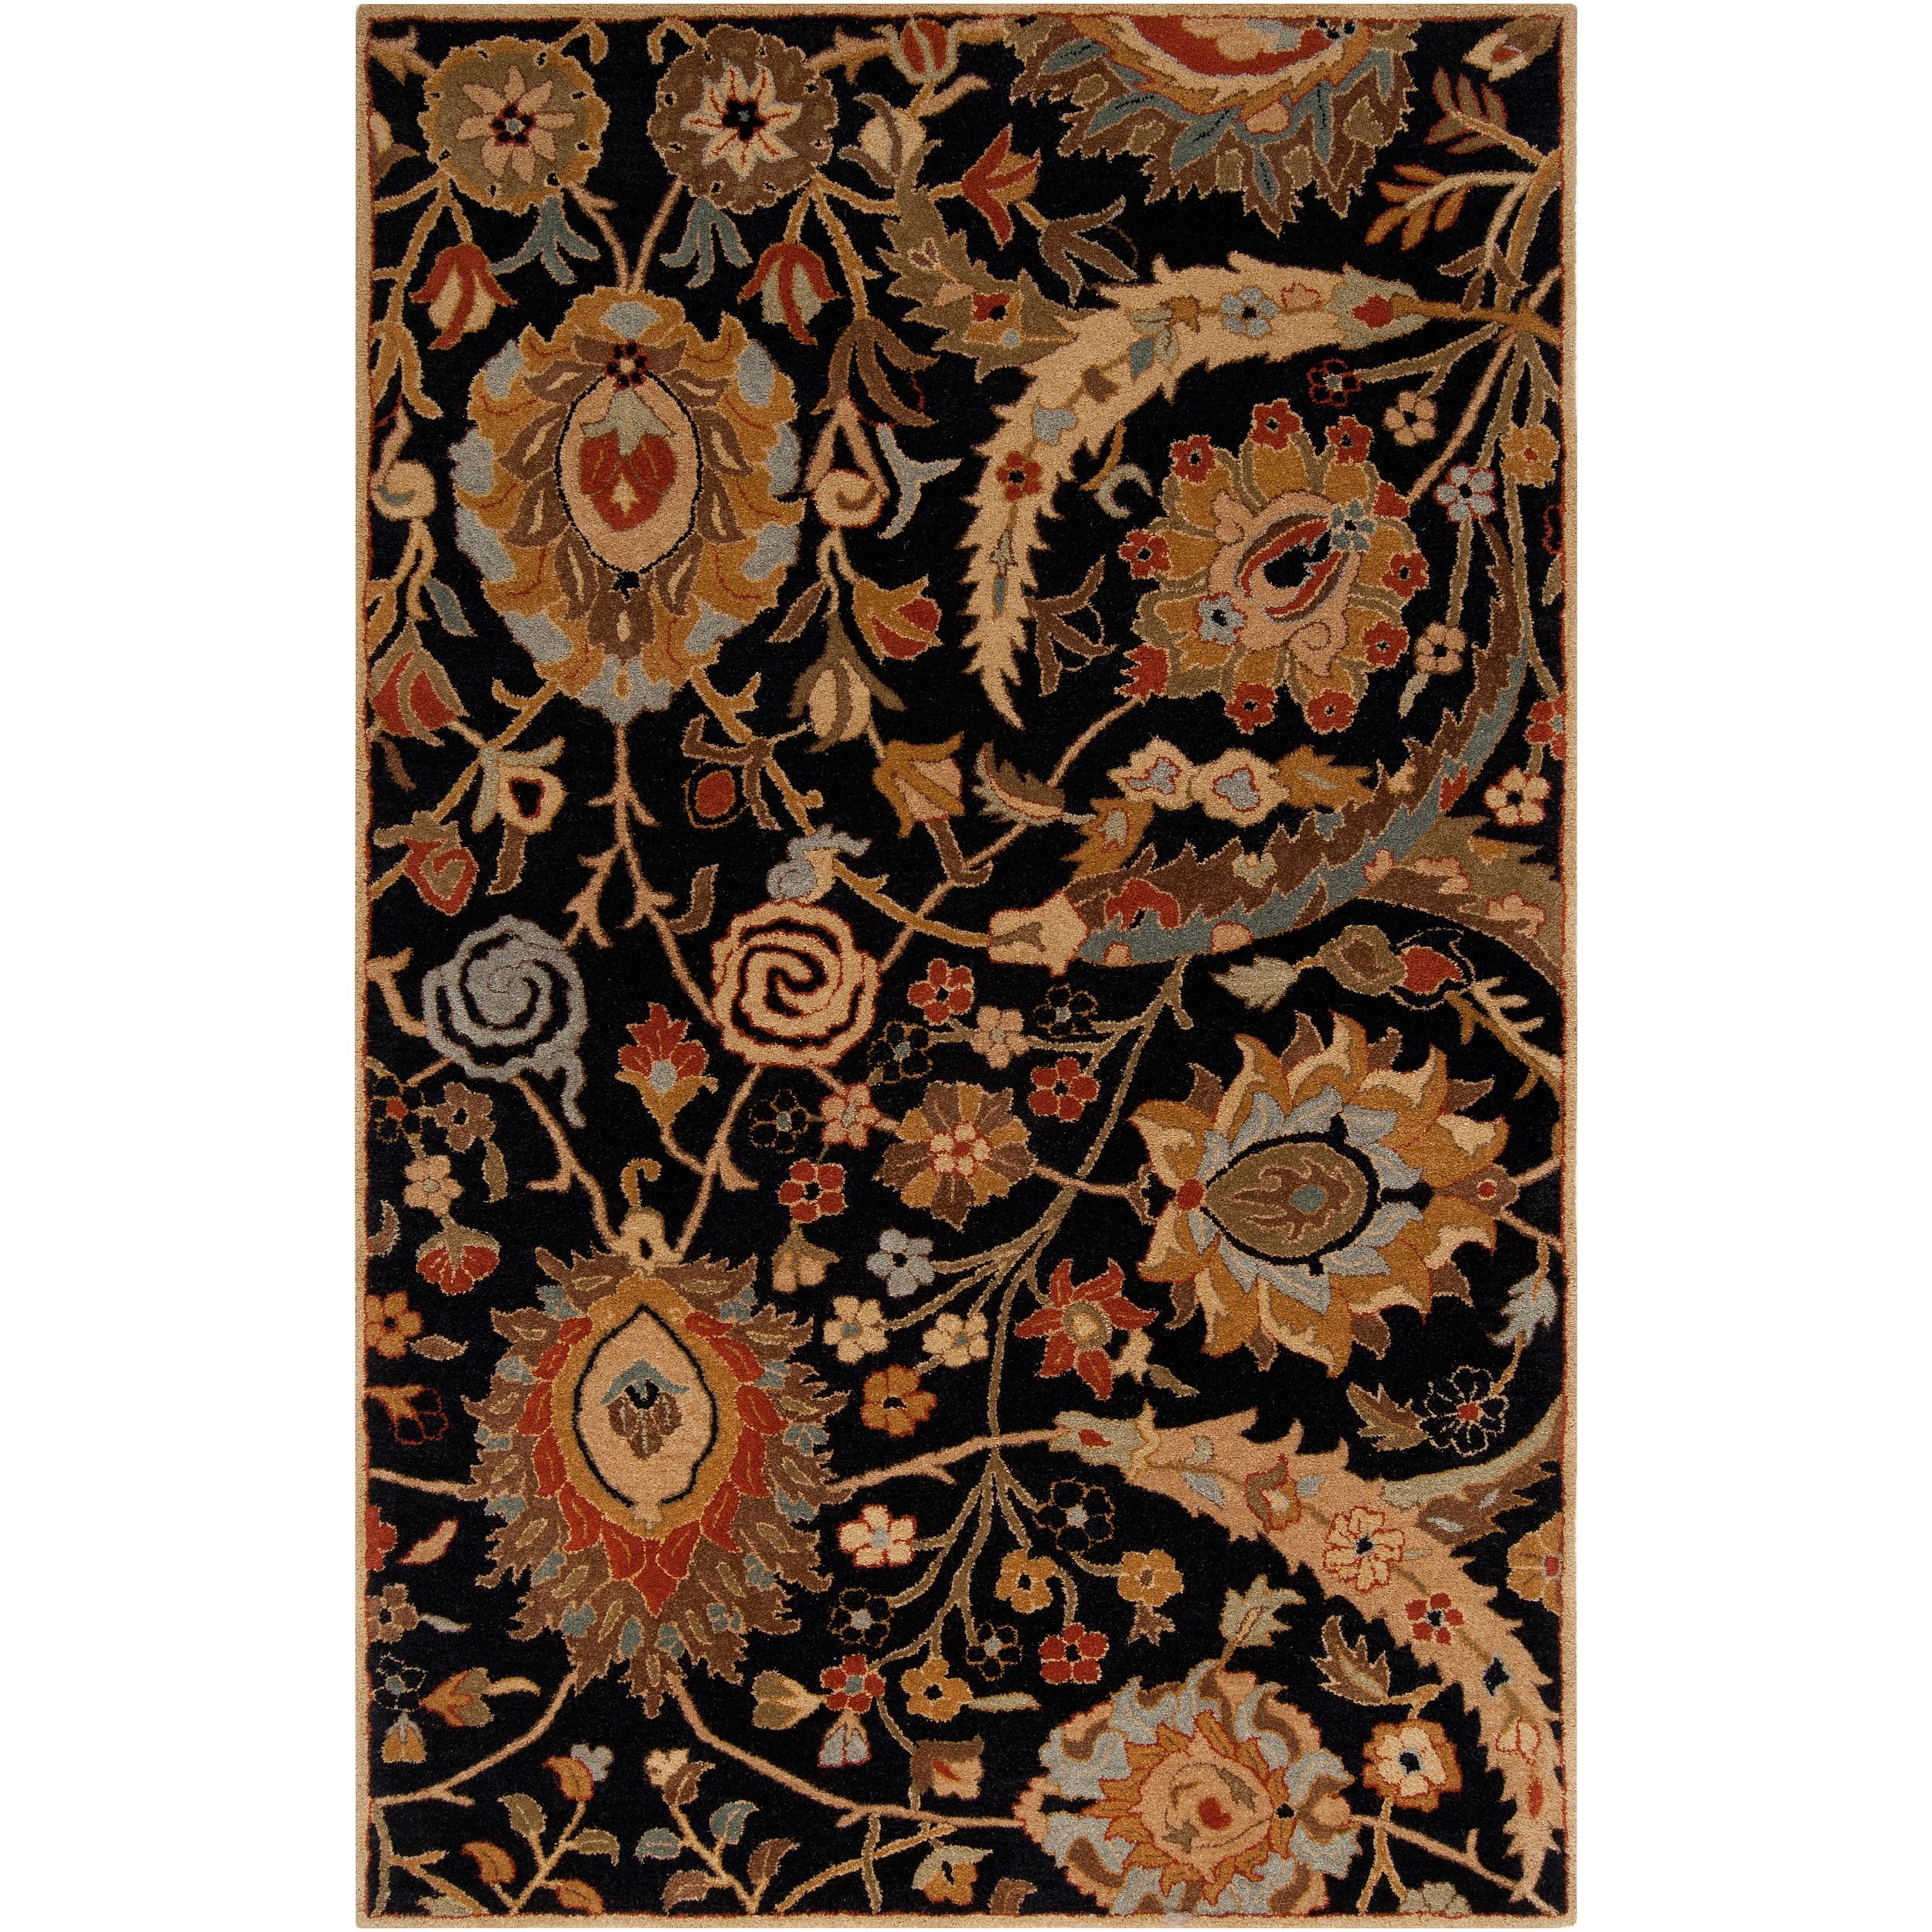 Hand-tufted Kings Bay Black Semi-Worsted New Zealand Wool Area Rug (5' x 8')